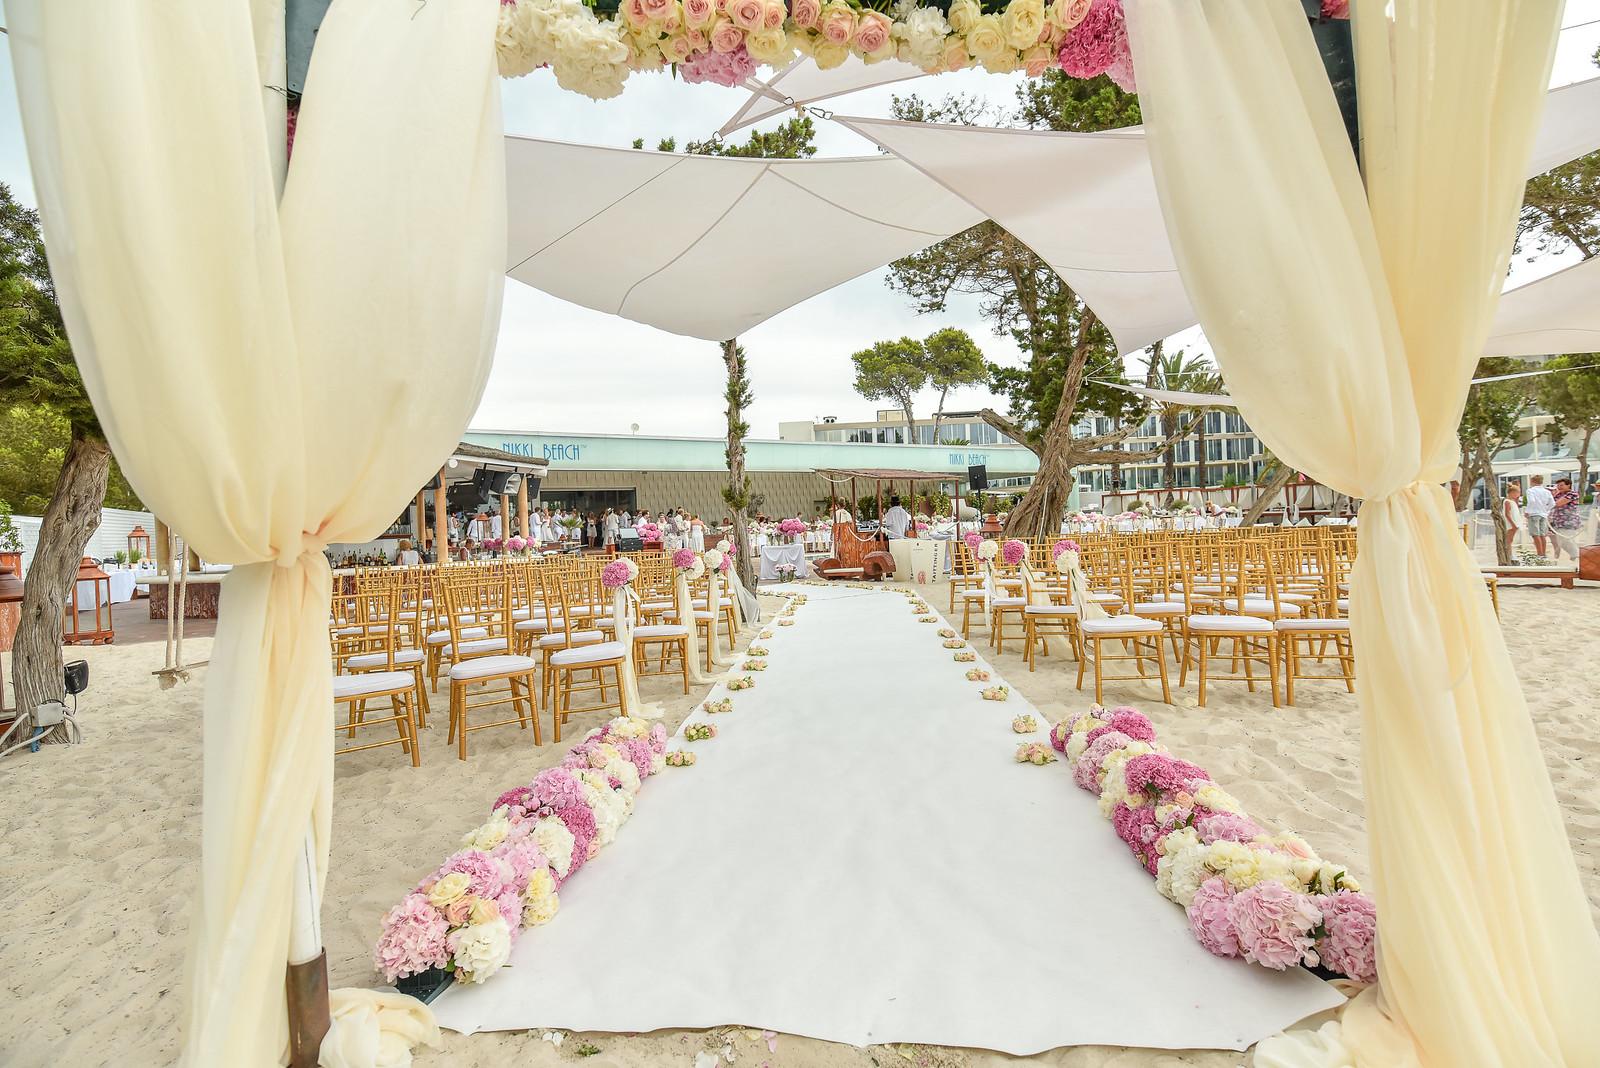 https://www.white-ibiza.com/wp-content/uploads/2020/07/white-ibiza-wedding-venue-nikki-beach-ibiza-2020-07.jpg